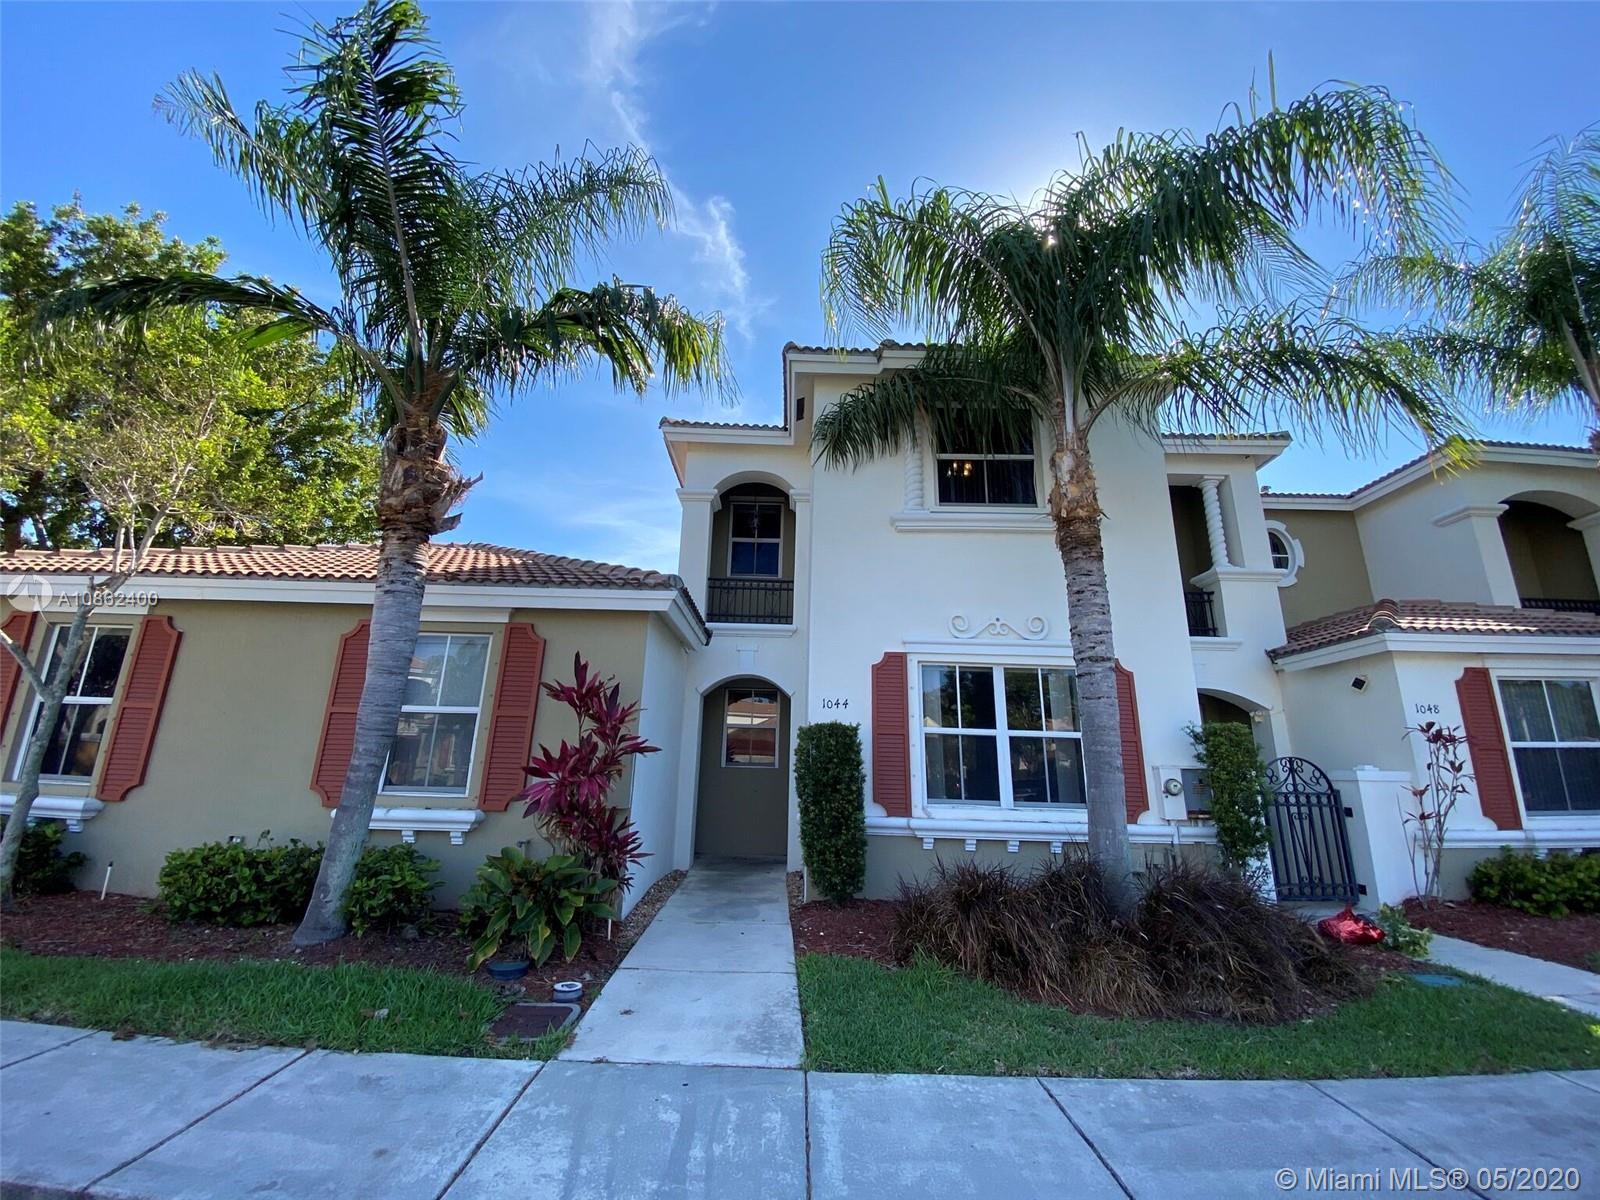 1044 NE 42nd Ter, Homestead, FL 33033 - Homestead, FL real estate listing